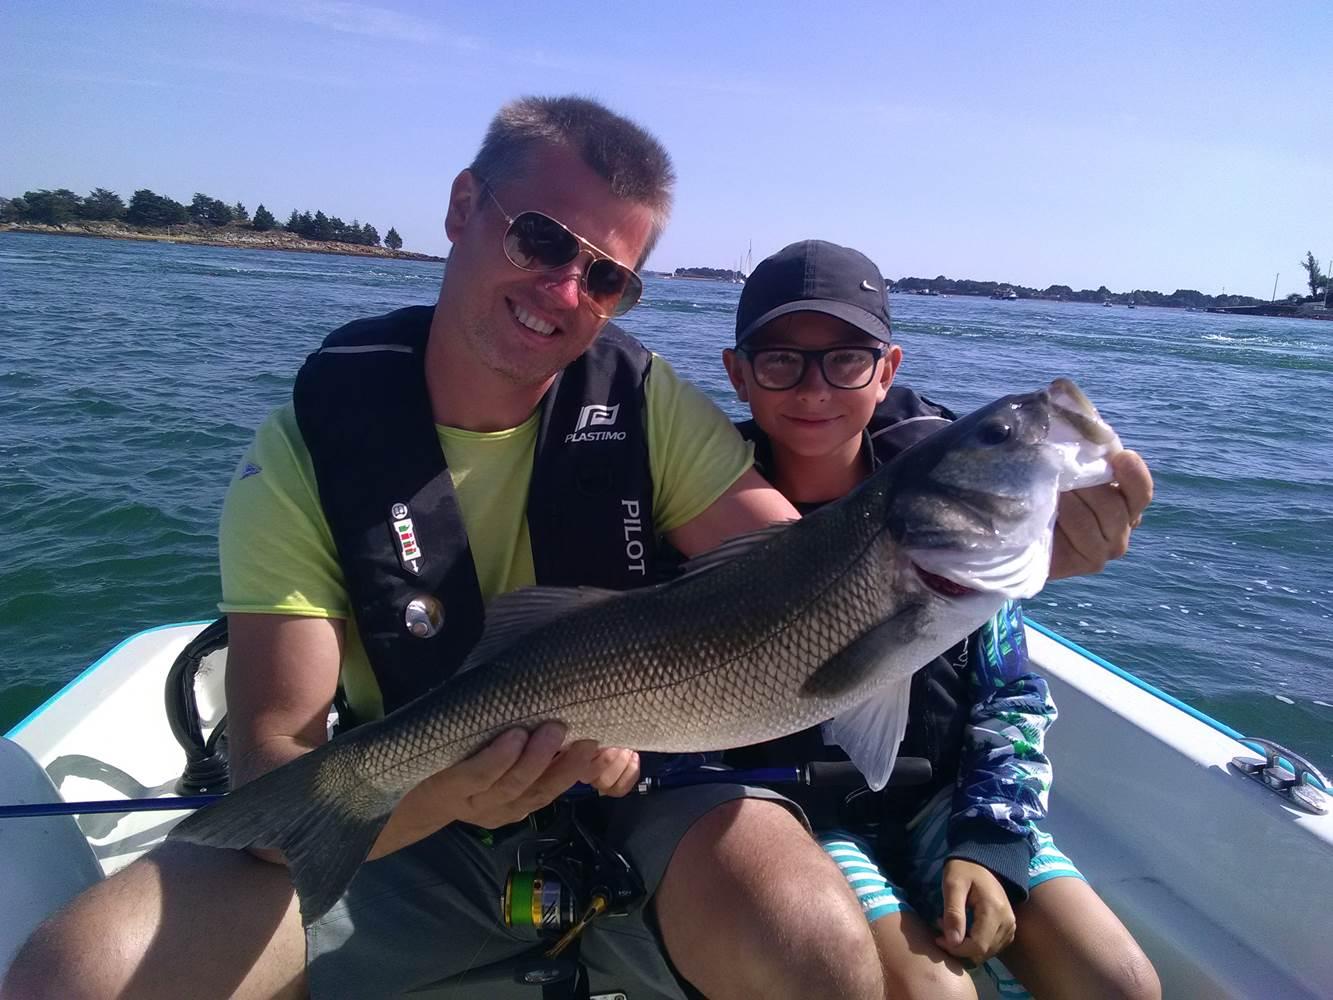 Horizons Pêche-Pêche en mer-Pêche en famille ©